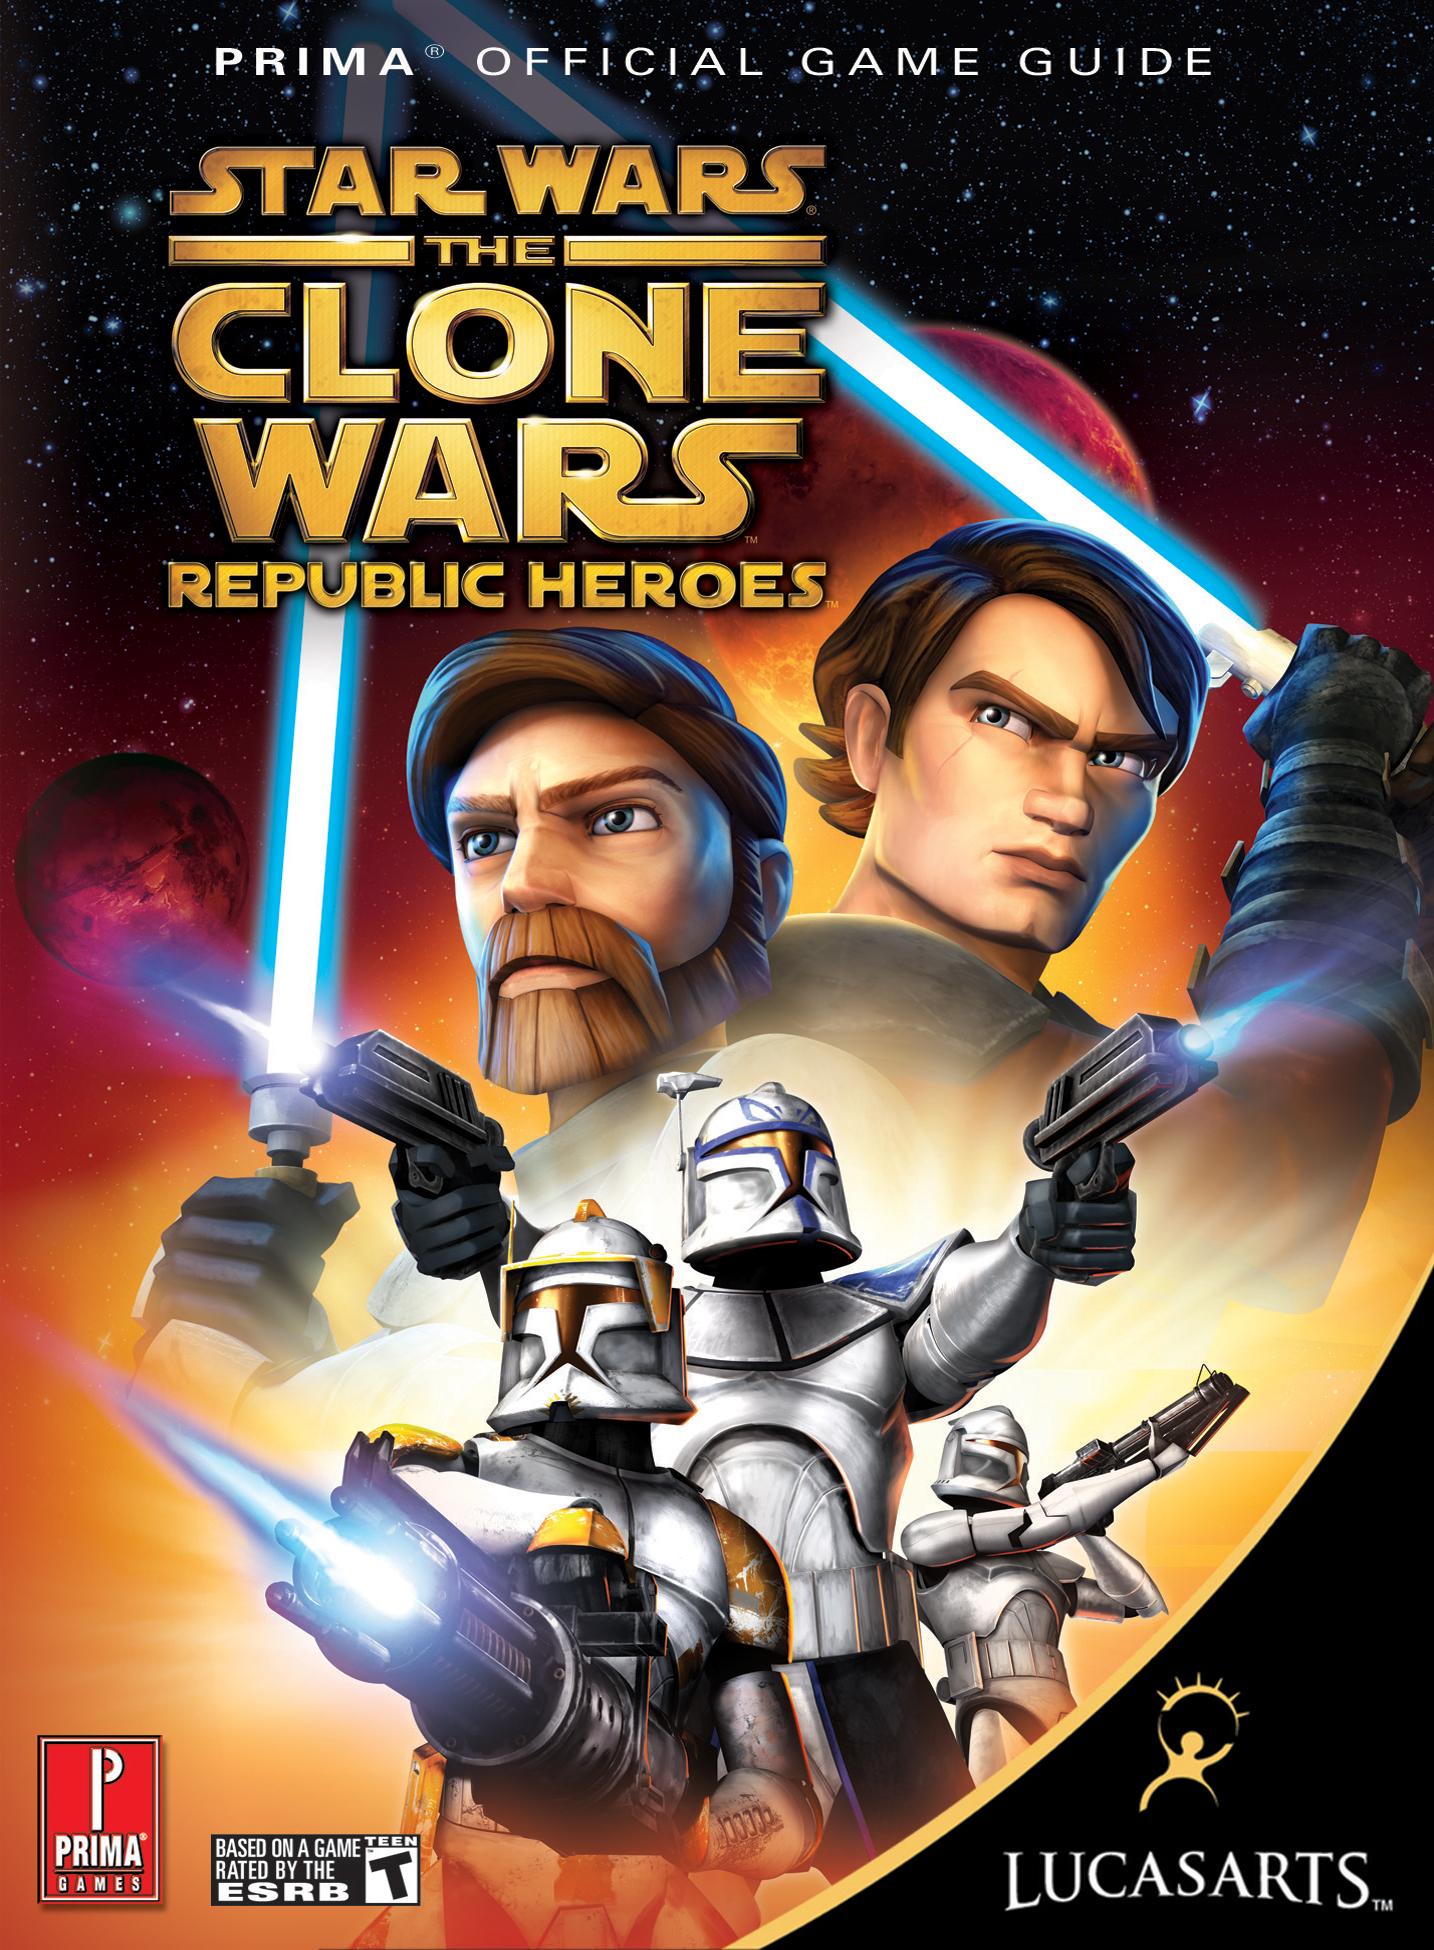 Star Wars: The Clone Wars: Republic Heroes: Официальное игровое руководство Prima